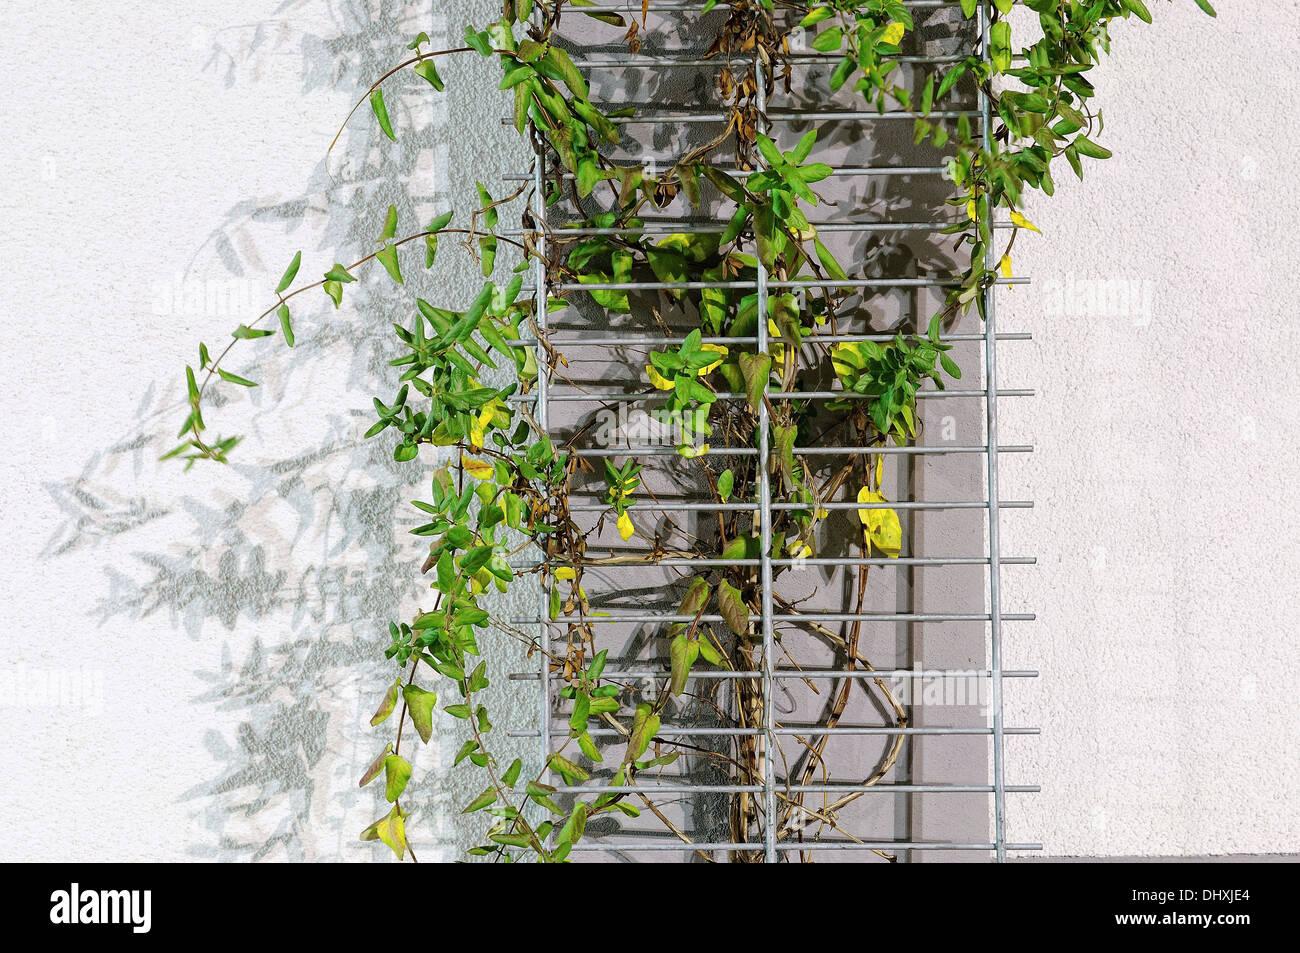 Metal Trellis Stockfotos & Metal Trellis Bilder - Alamy